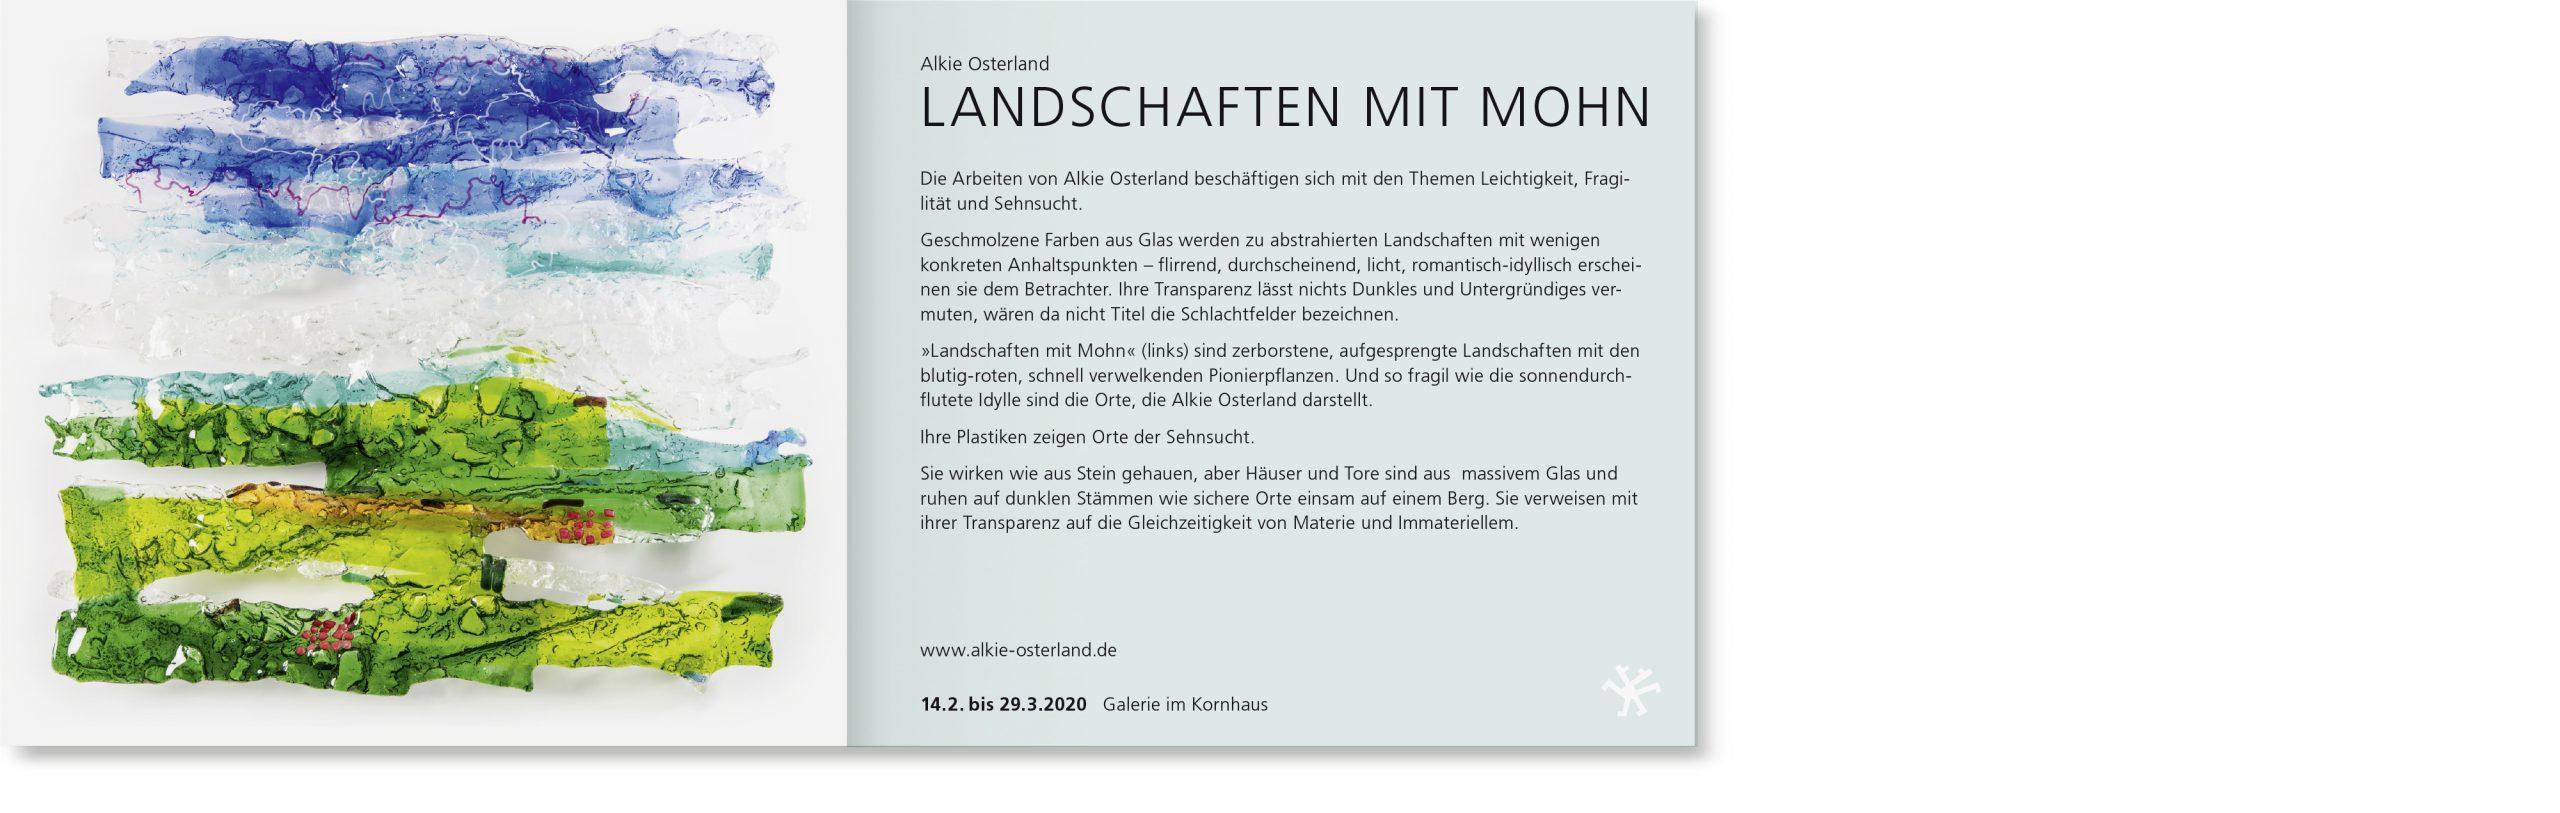 fh-web-kunstverein-programmheft-2019-3-1-scaled.jpg